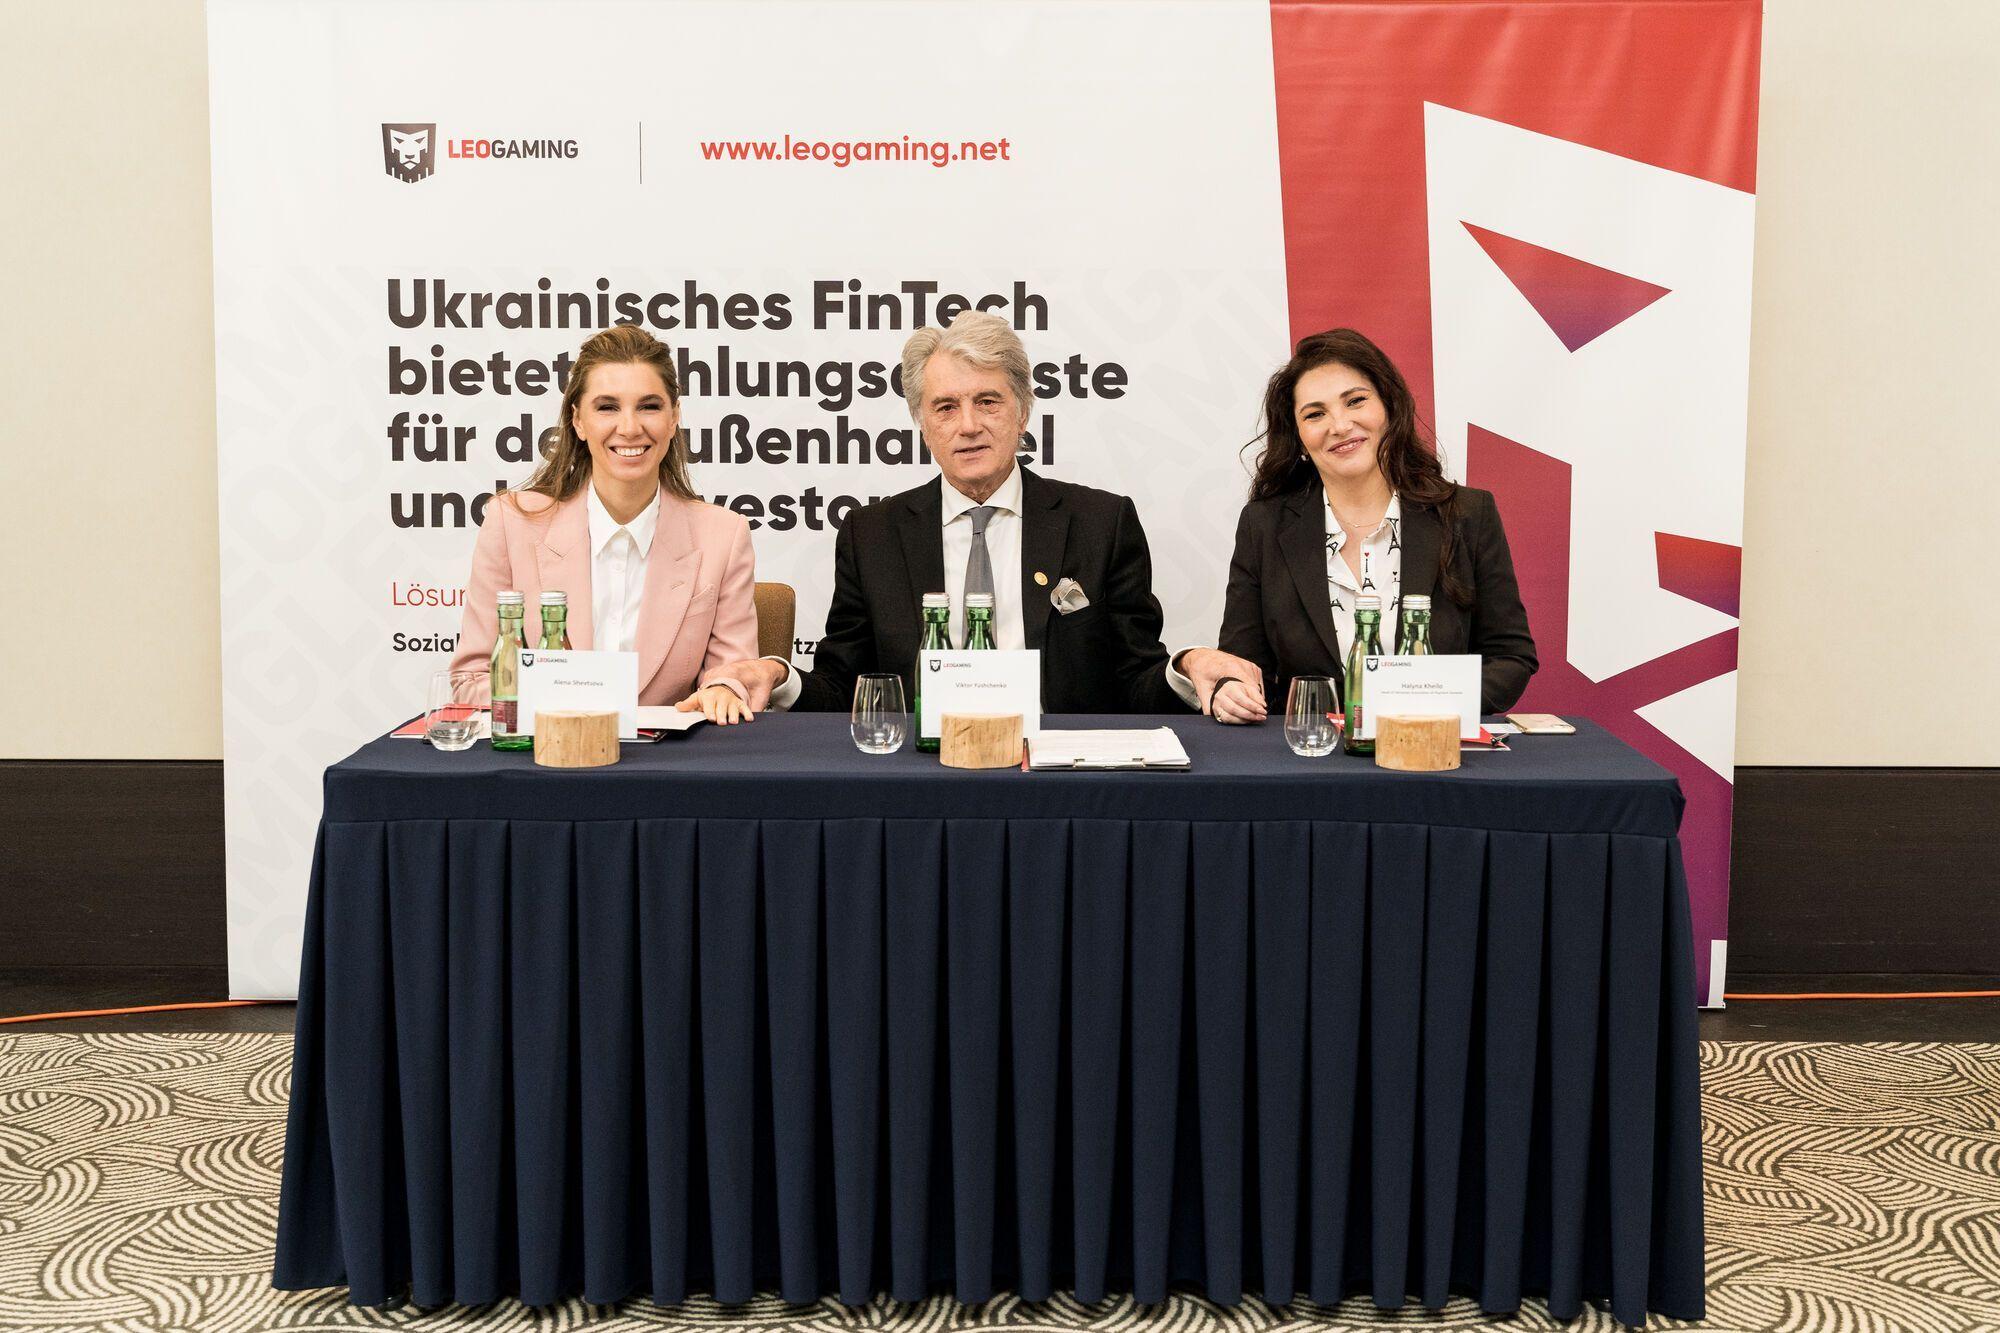 Алена Дегрик Шевцова, Виктор Ющенко, Галина Хейло на пресс-конференции в Вене